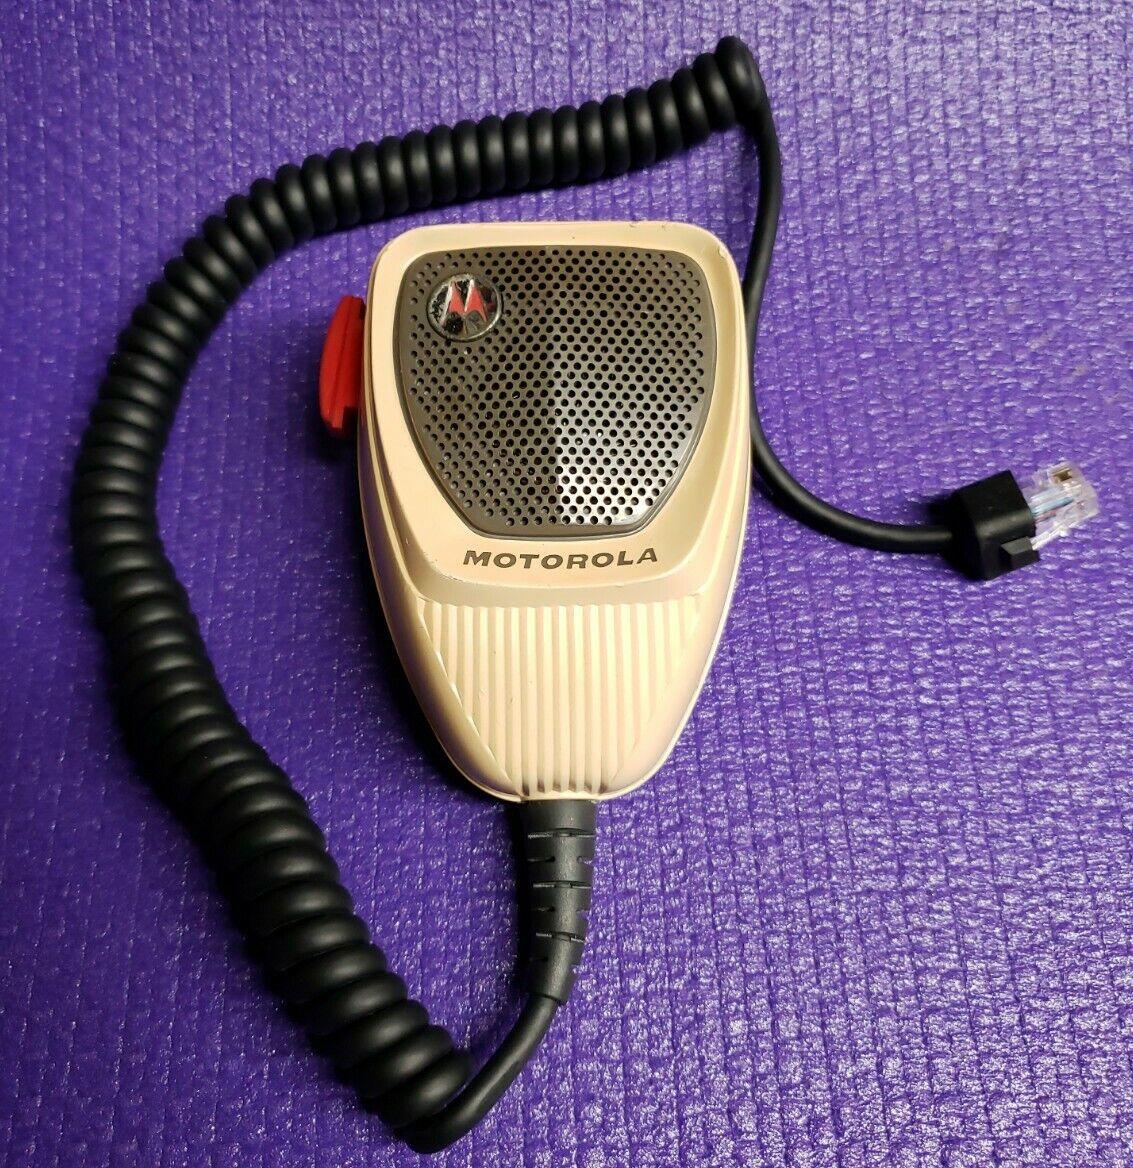 Vintage Motorola Microphone GM300 CM300 RADIUS Maxtrac M1225 MCS2000 CDM1250 #3. Available Now for 125.00